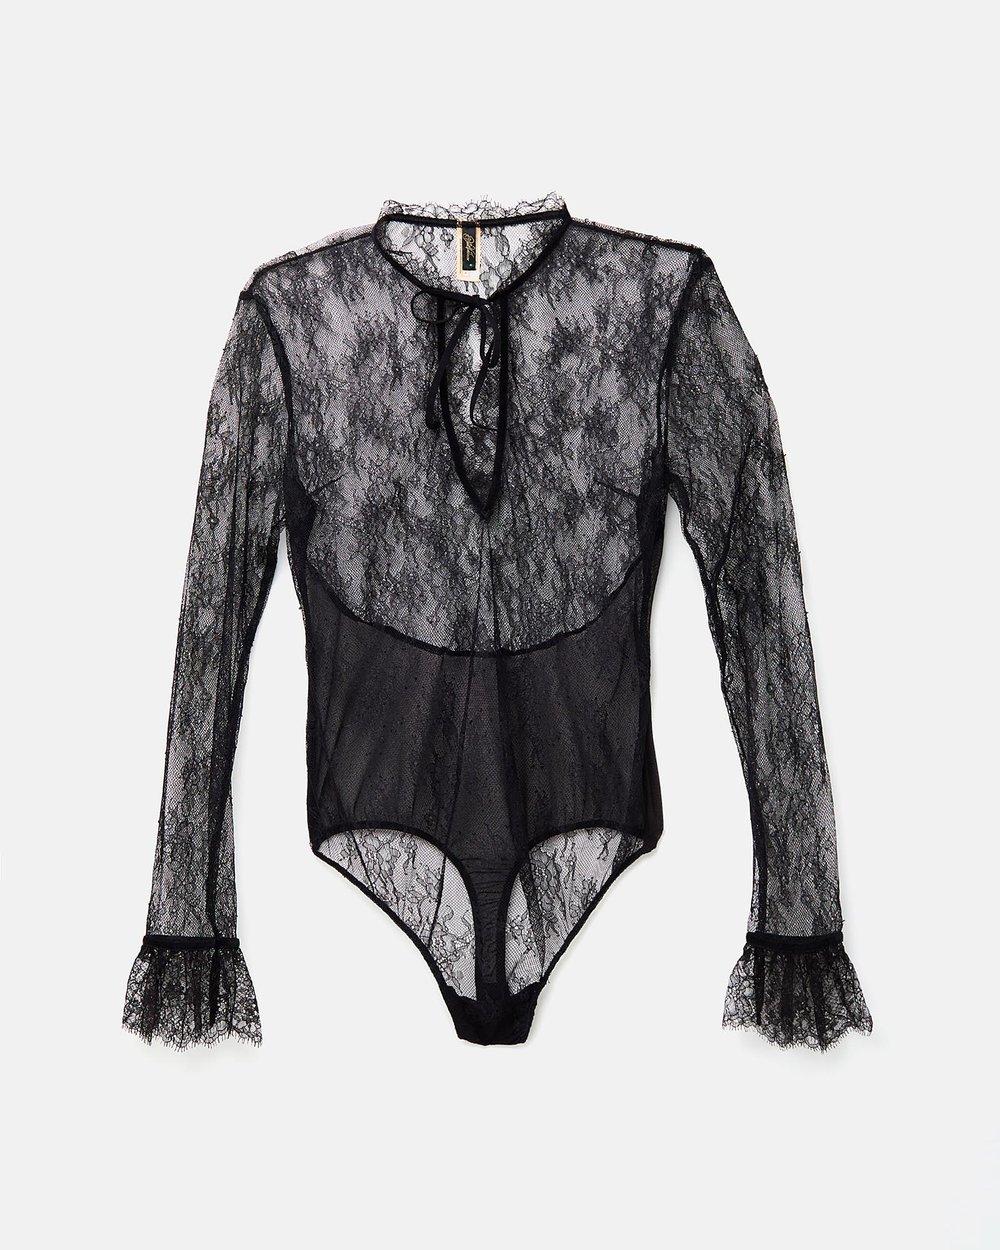 Miss West Bodysuit By Dita Von Teese Online The Iconic Australia